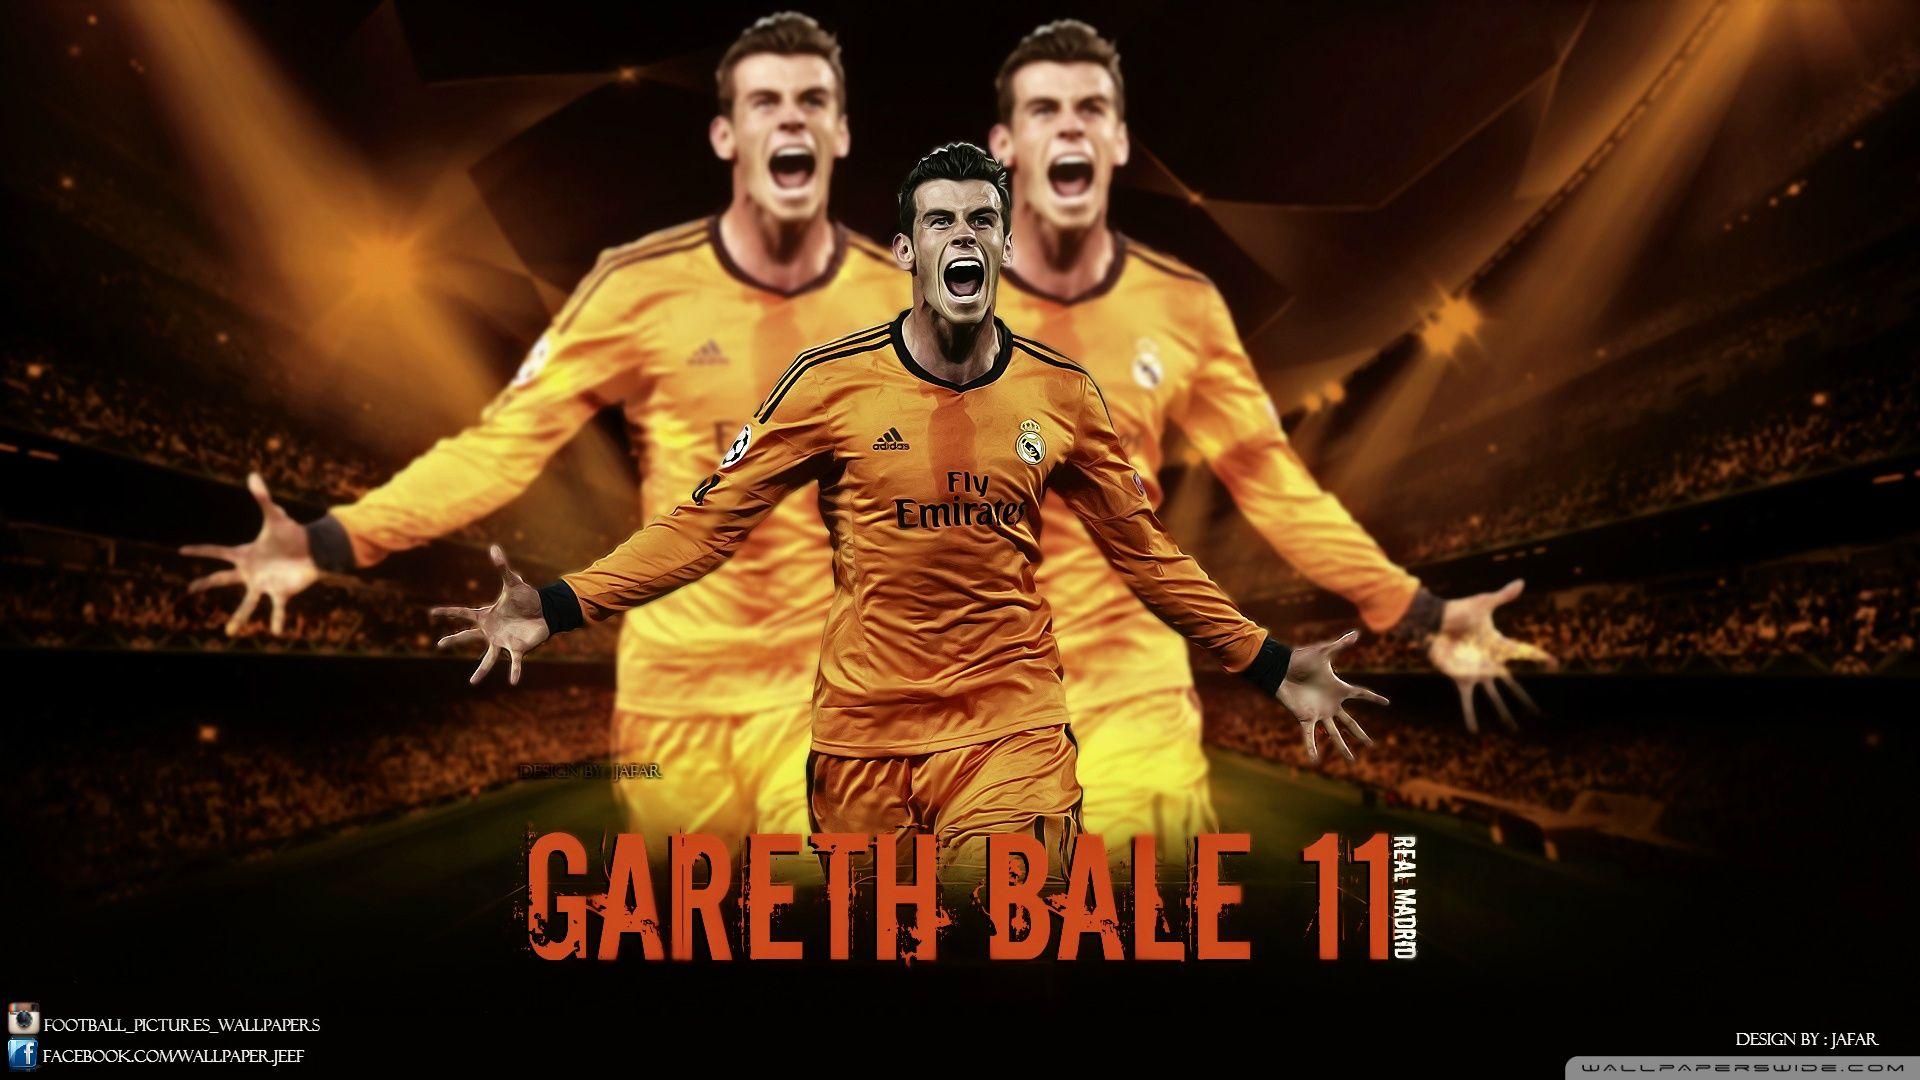 Gareth Bale Real Madrid Wallpaper Desktop Backgrounds Best Wallpapers Hq Gareth Bale Madrid Wallpaper Real Madrid Wallpapers